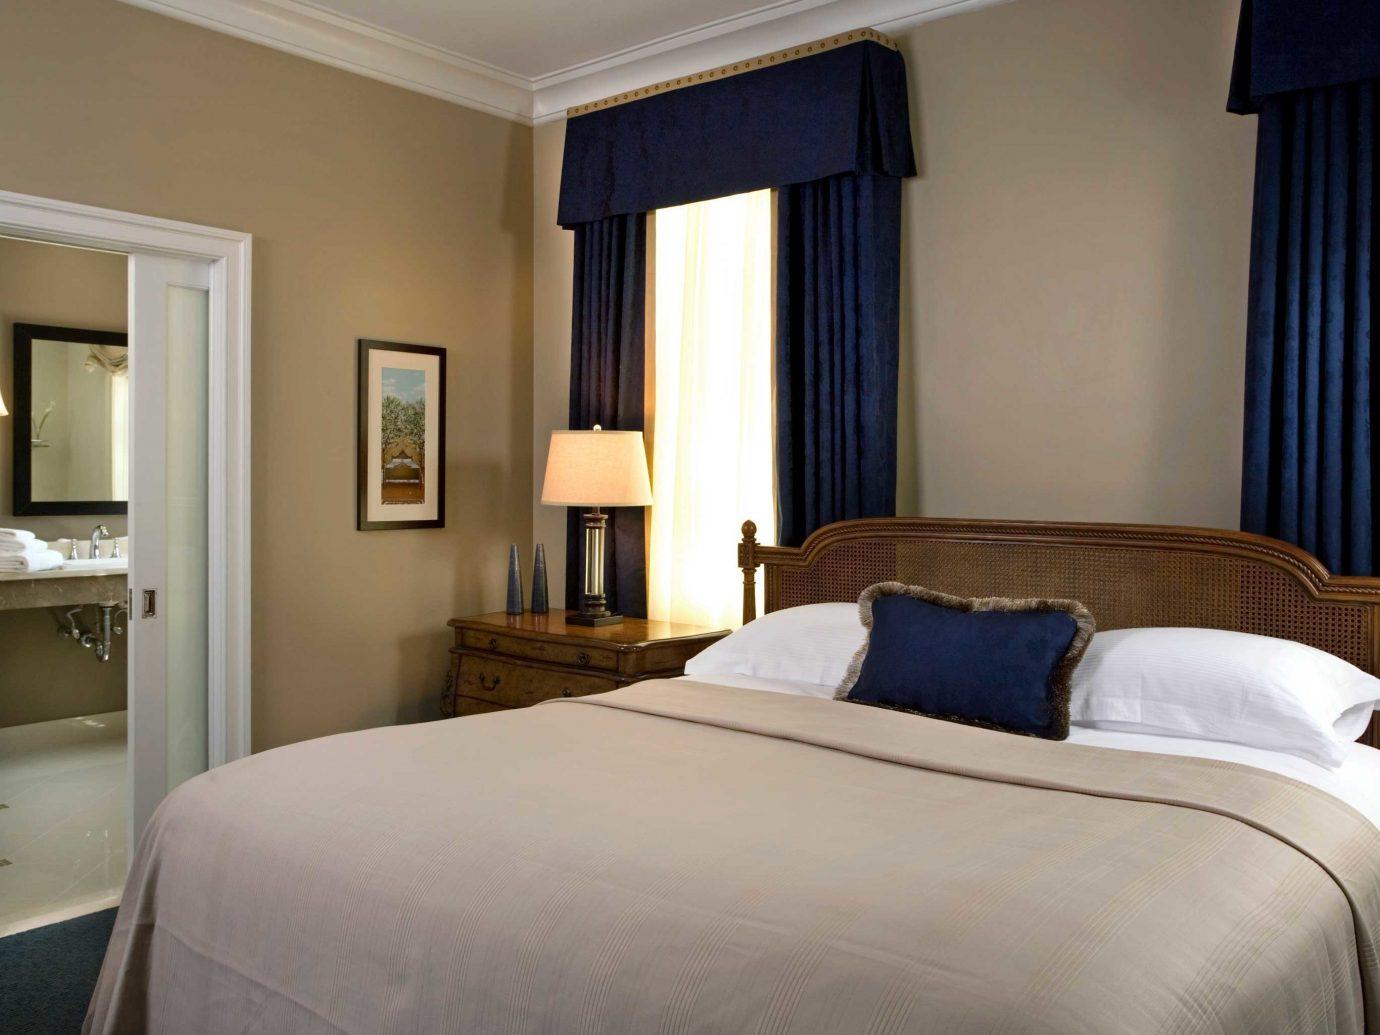 Bedroom Boutique Boutique Hotels Classic Elegant Historic Hotels Inn Philadelphia bed indoor wall hotel sofa room floor property Suite scene estate cottage home real estate interior design apartment